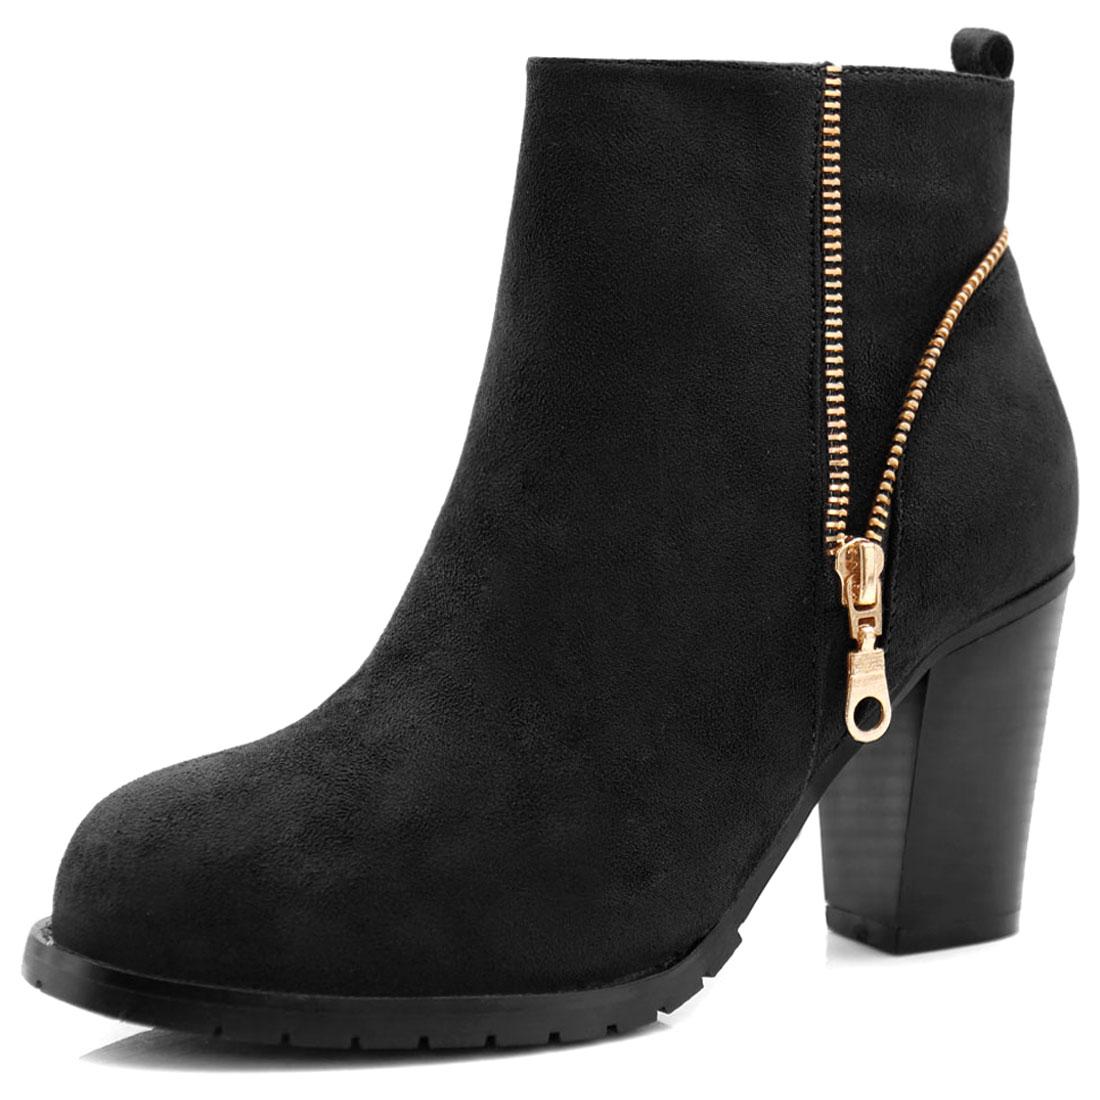 Women Round Toe Zipper Detail Block Heel Ankle Boots Black US 9